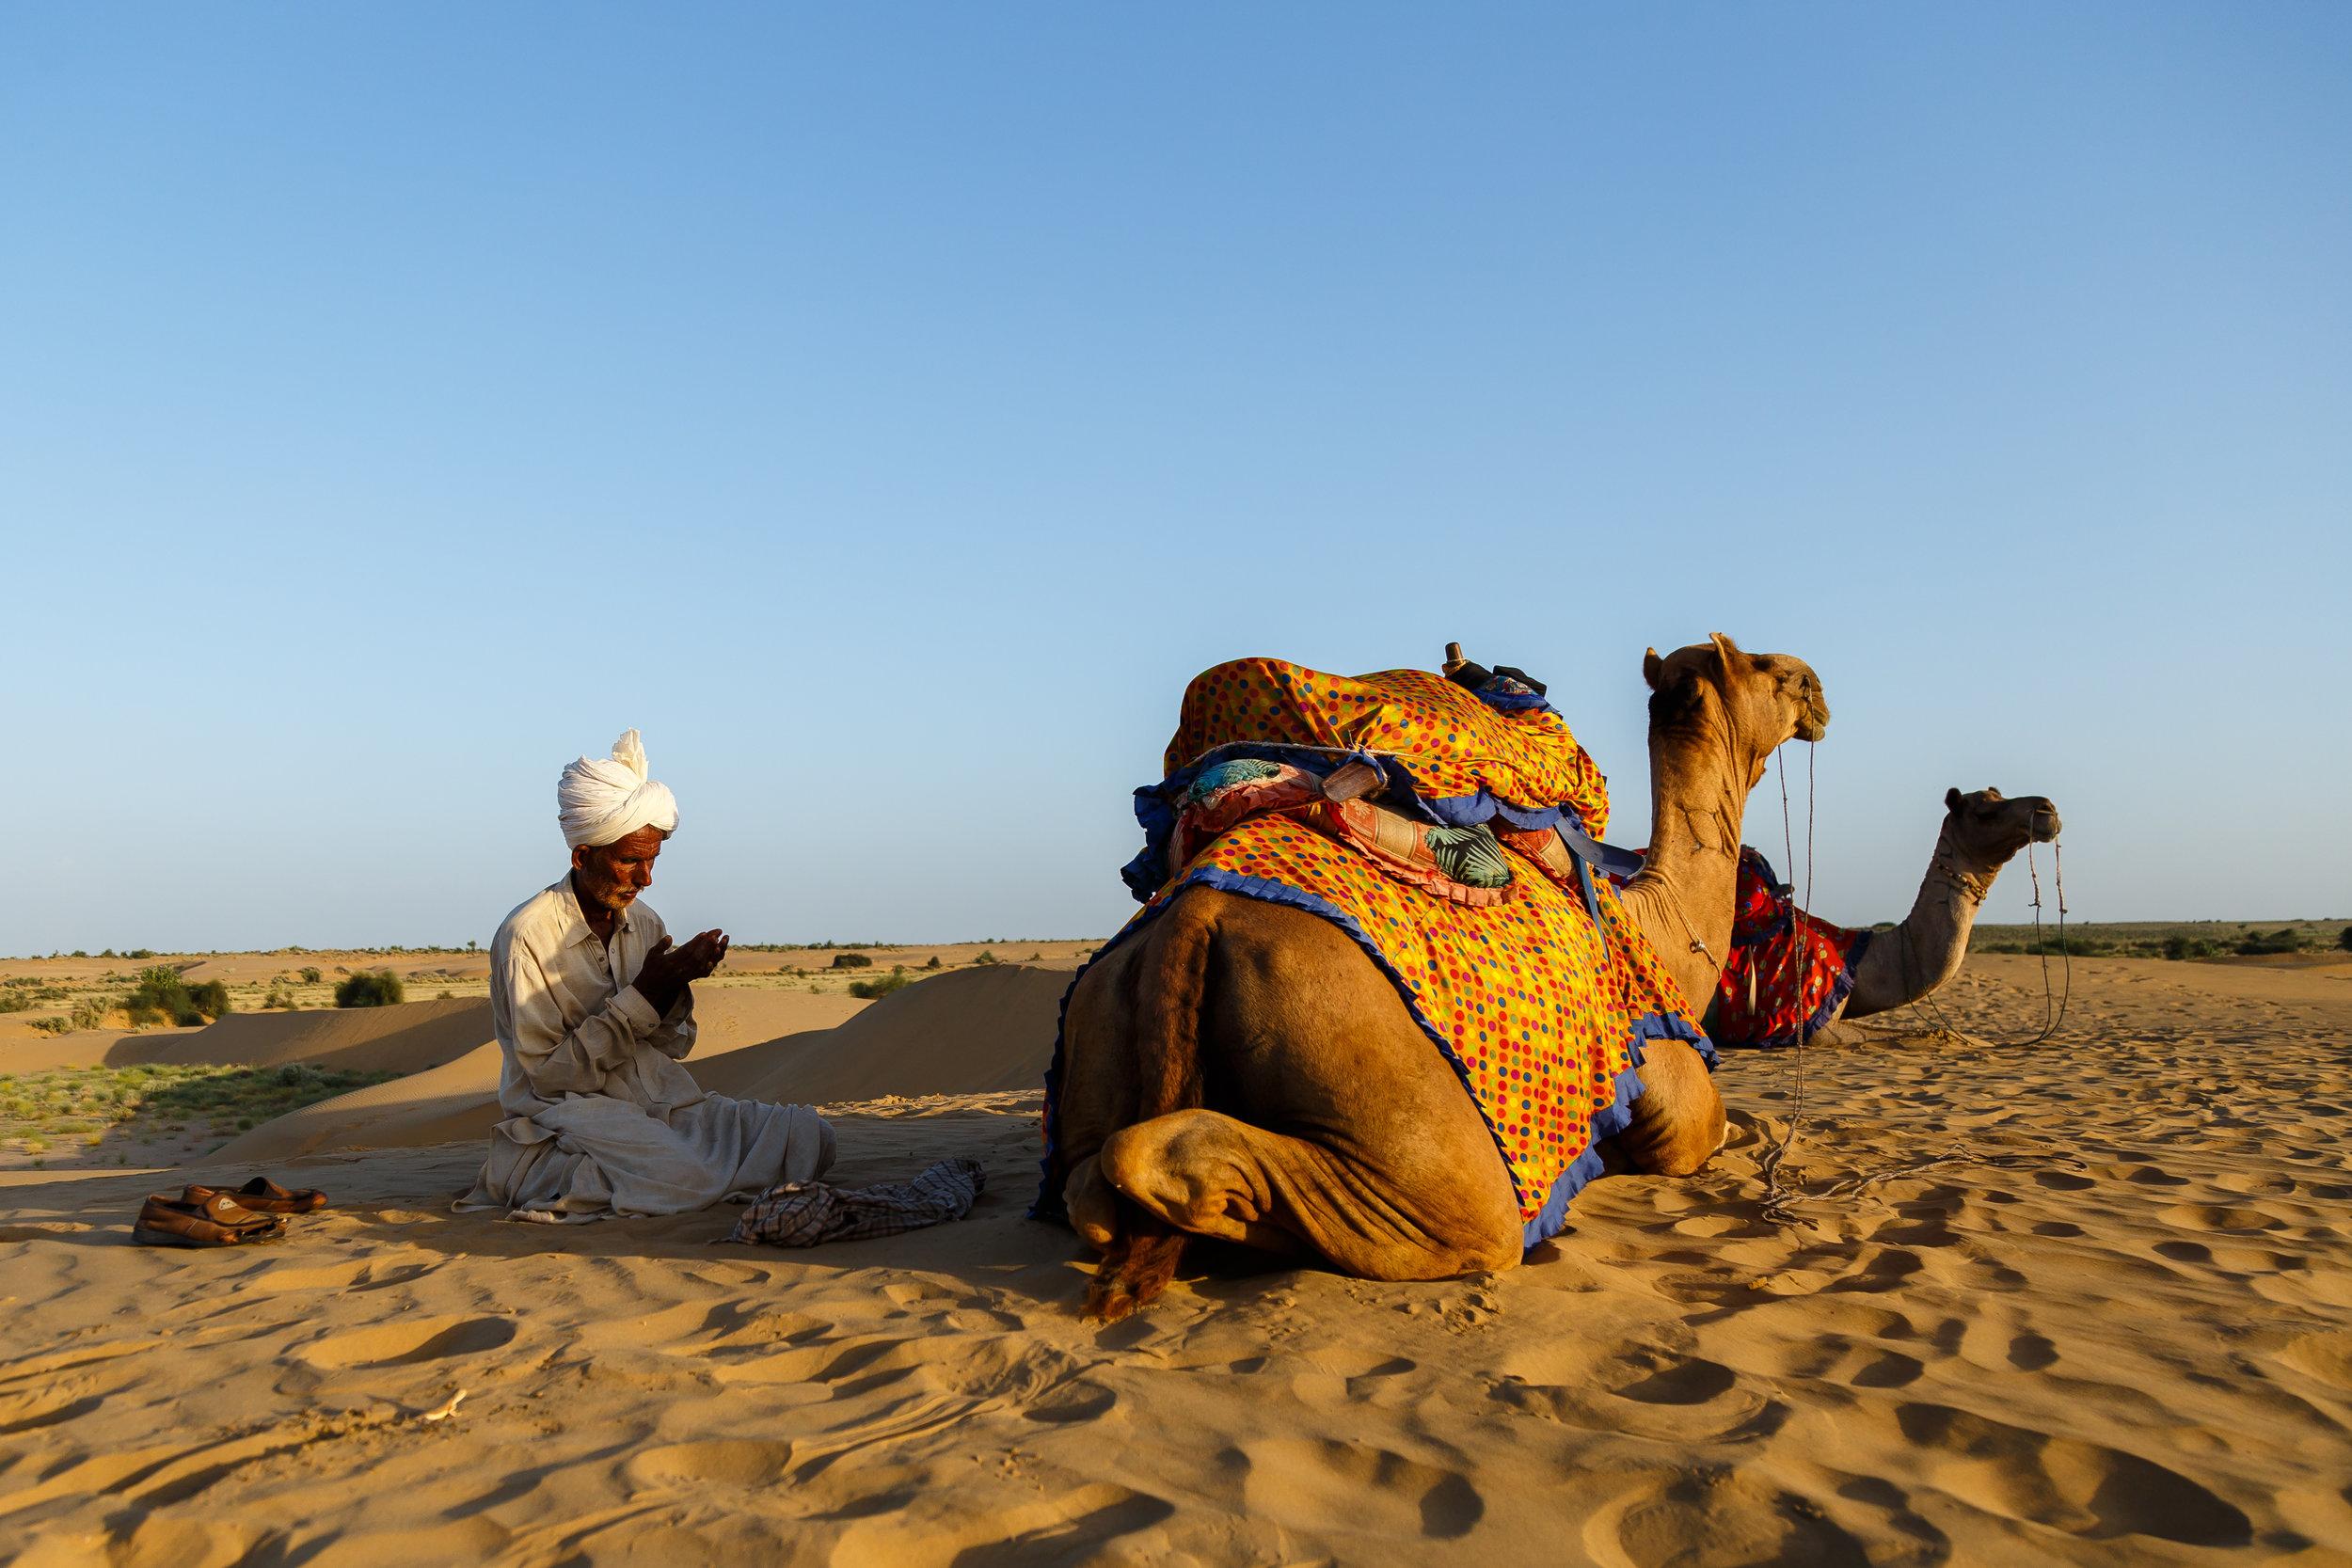 A camel rider in Sam desert dunes in Jaisalmer, Rajasthan taking